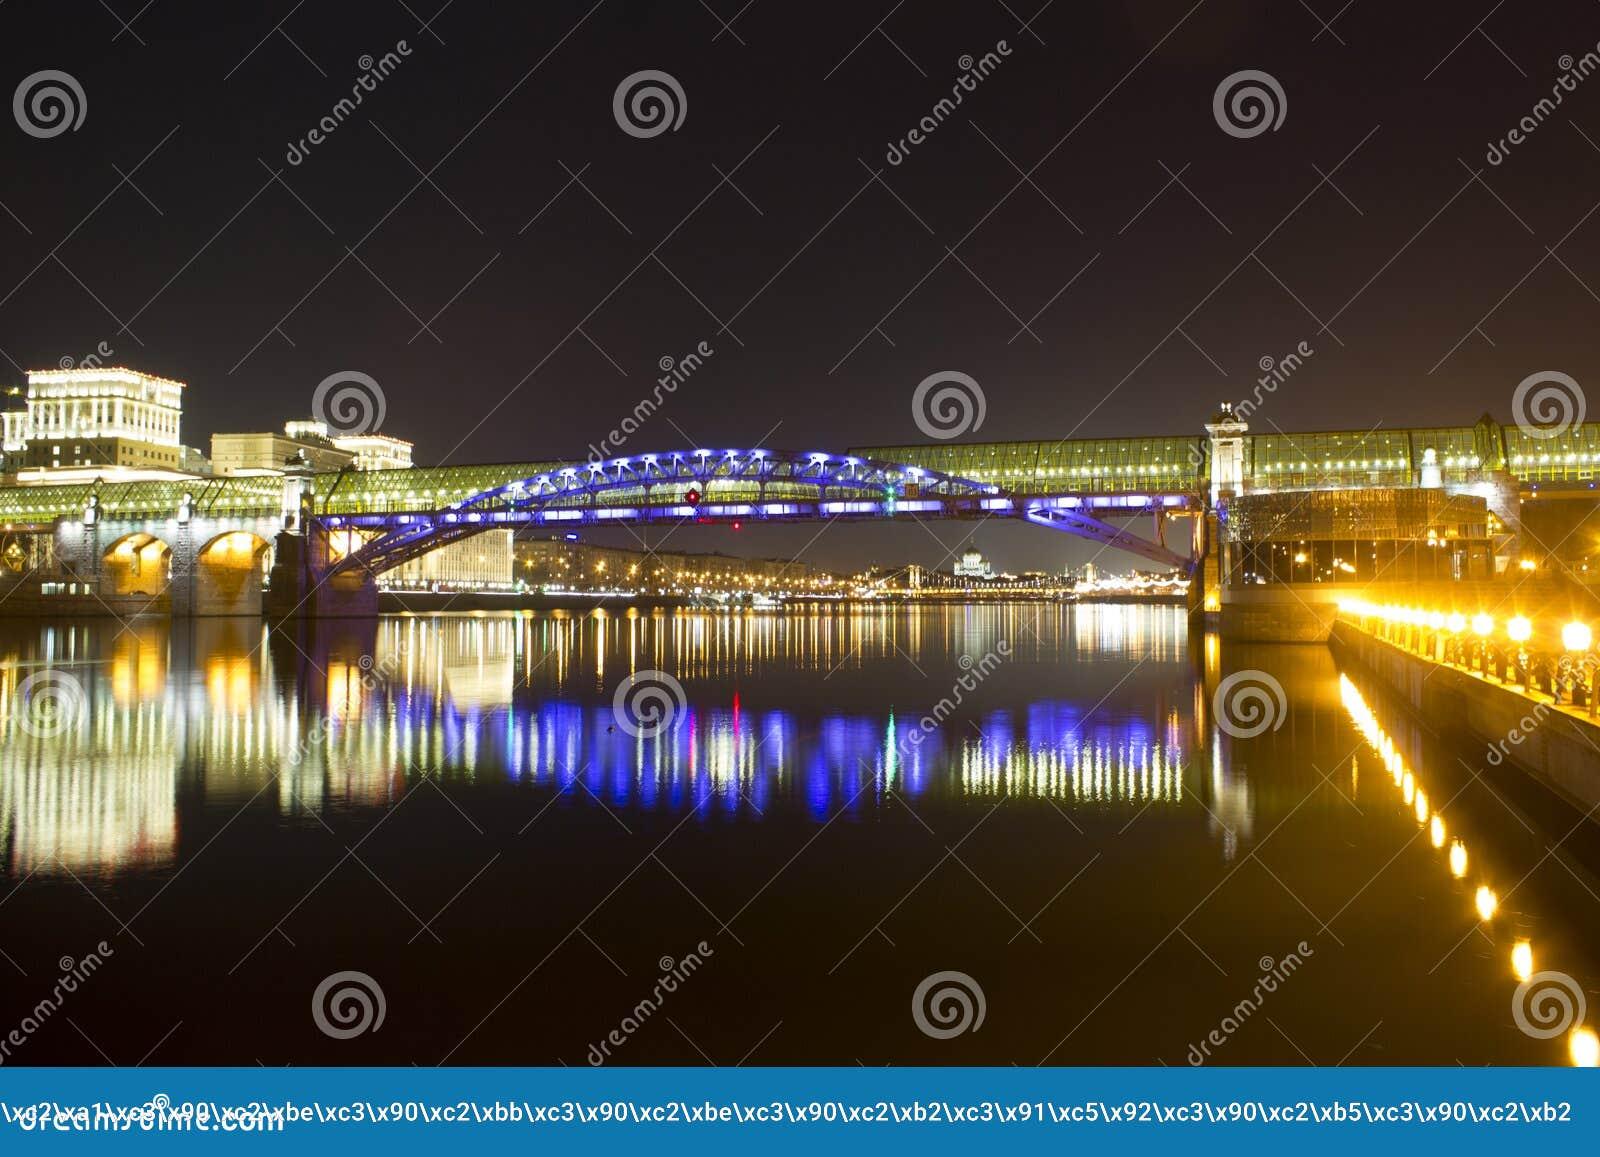 Download Andreevsky桥梁 库存图片. 图片 包括有 高涨, 结算, 晚上, 橄榄, 天空, 火箭筒, 强光 - 50690109